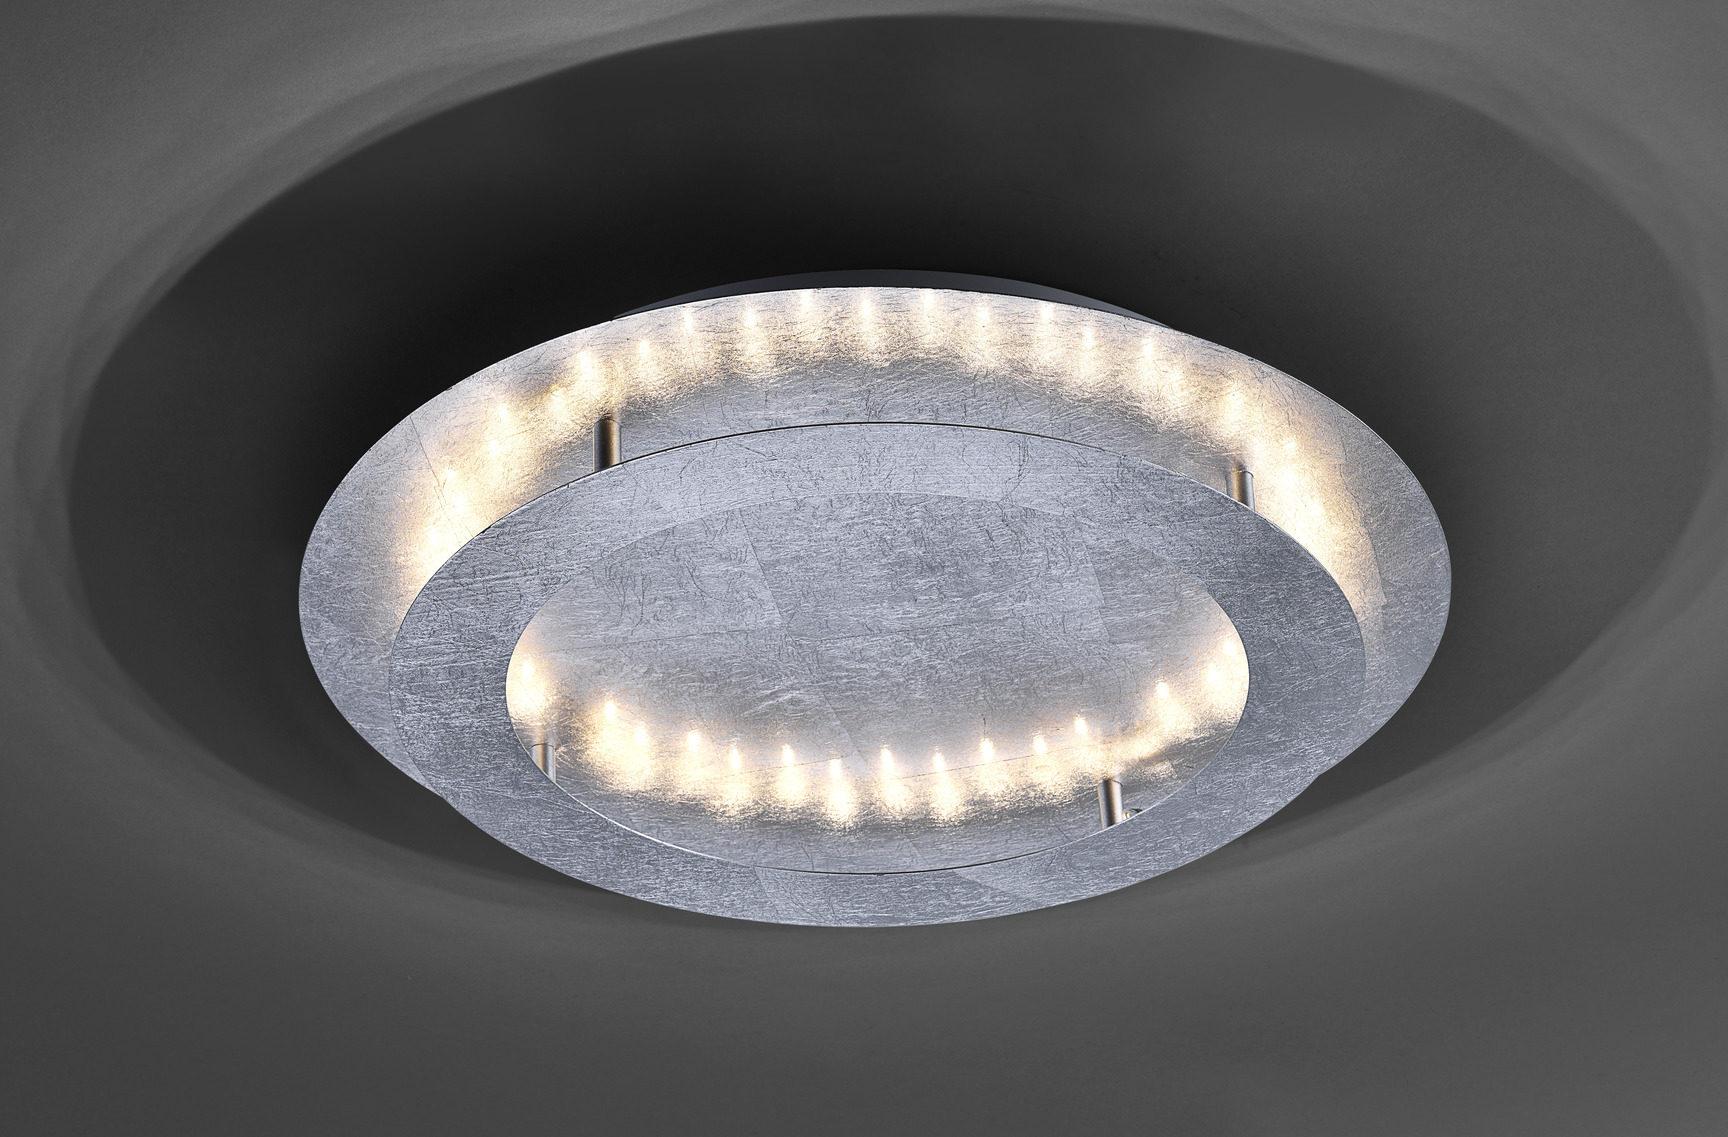 Industriele Lampen Outlet : Cm lampen trendy nieuw taupe kleur kap hoog lampenkap stof klein